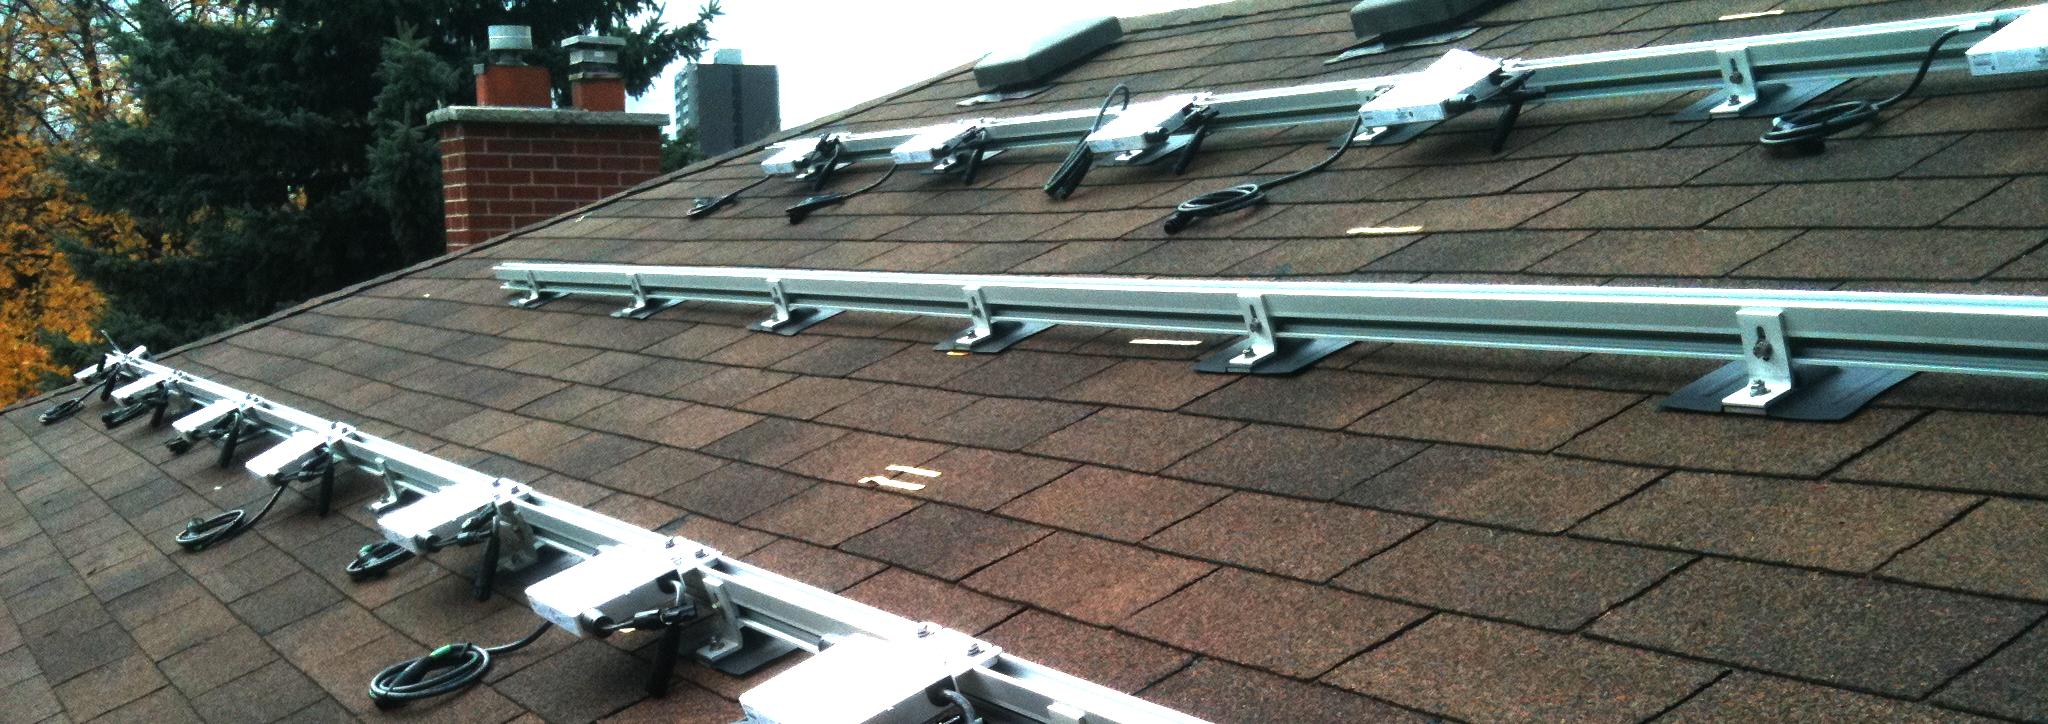 Shingled Roof Kinetic Solar Racking And Mounting